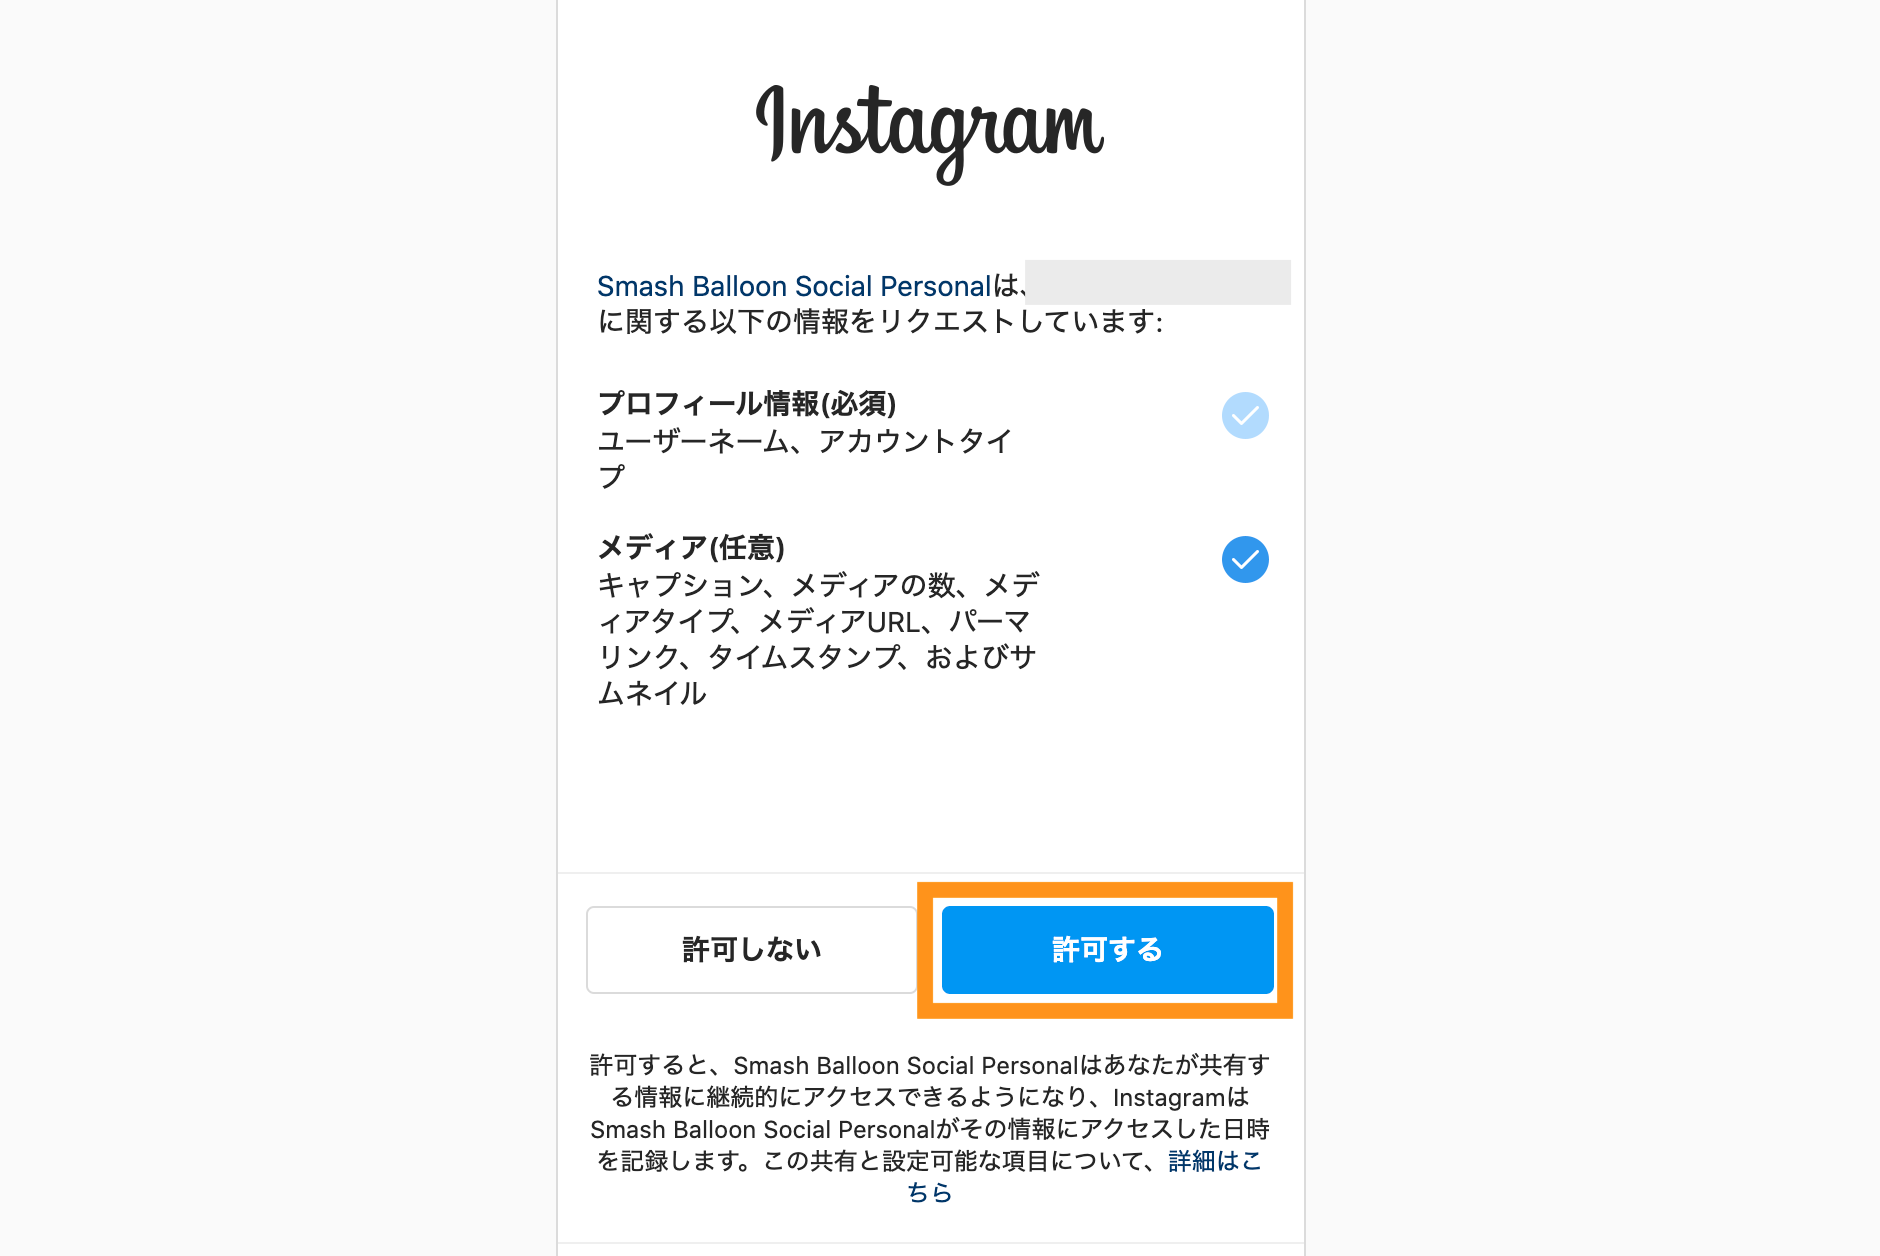 Instagramにログイン>接続を許可